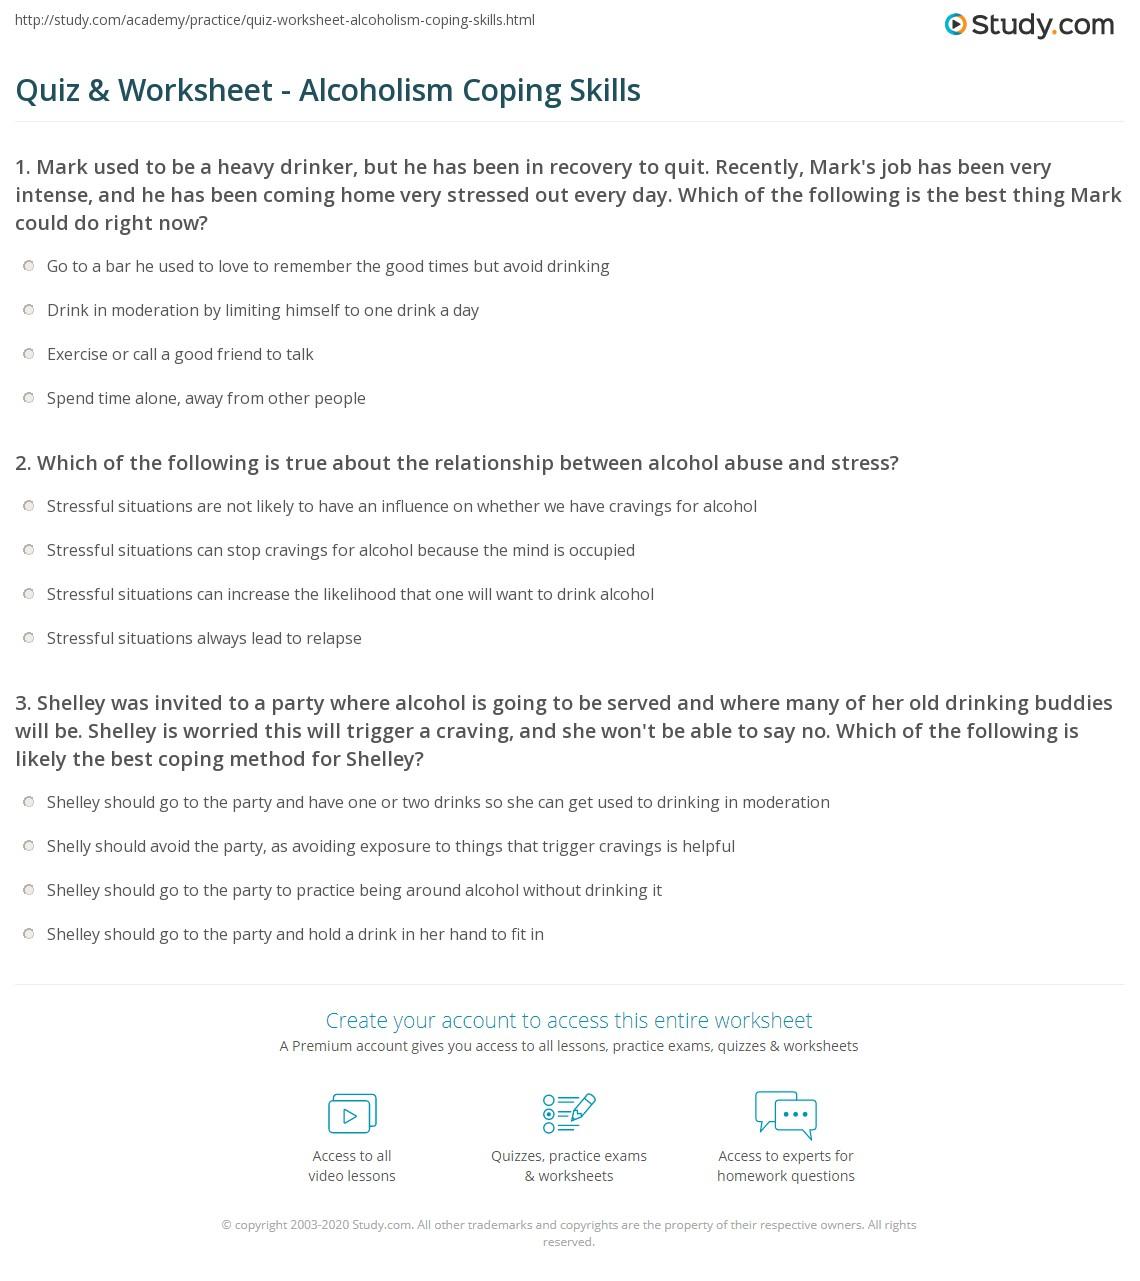 worksheet Coping With Cravings Worksheet quiz worksheet alcoholism coping skills study com print mechanisms for alcoholics worksheet